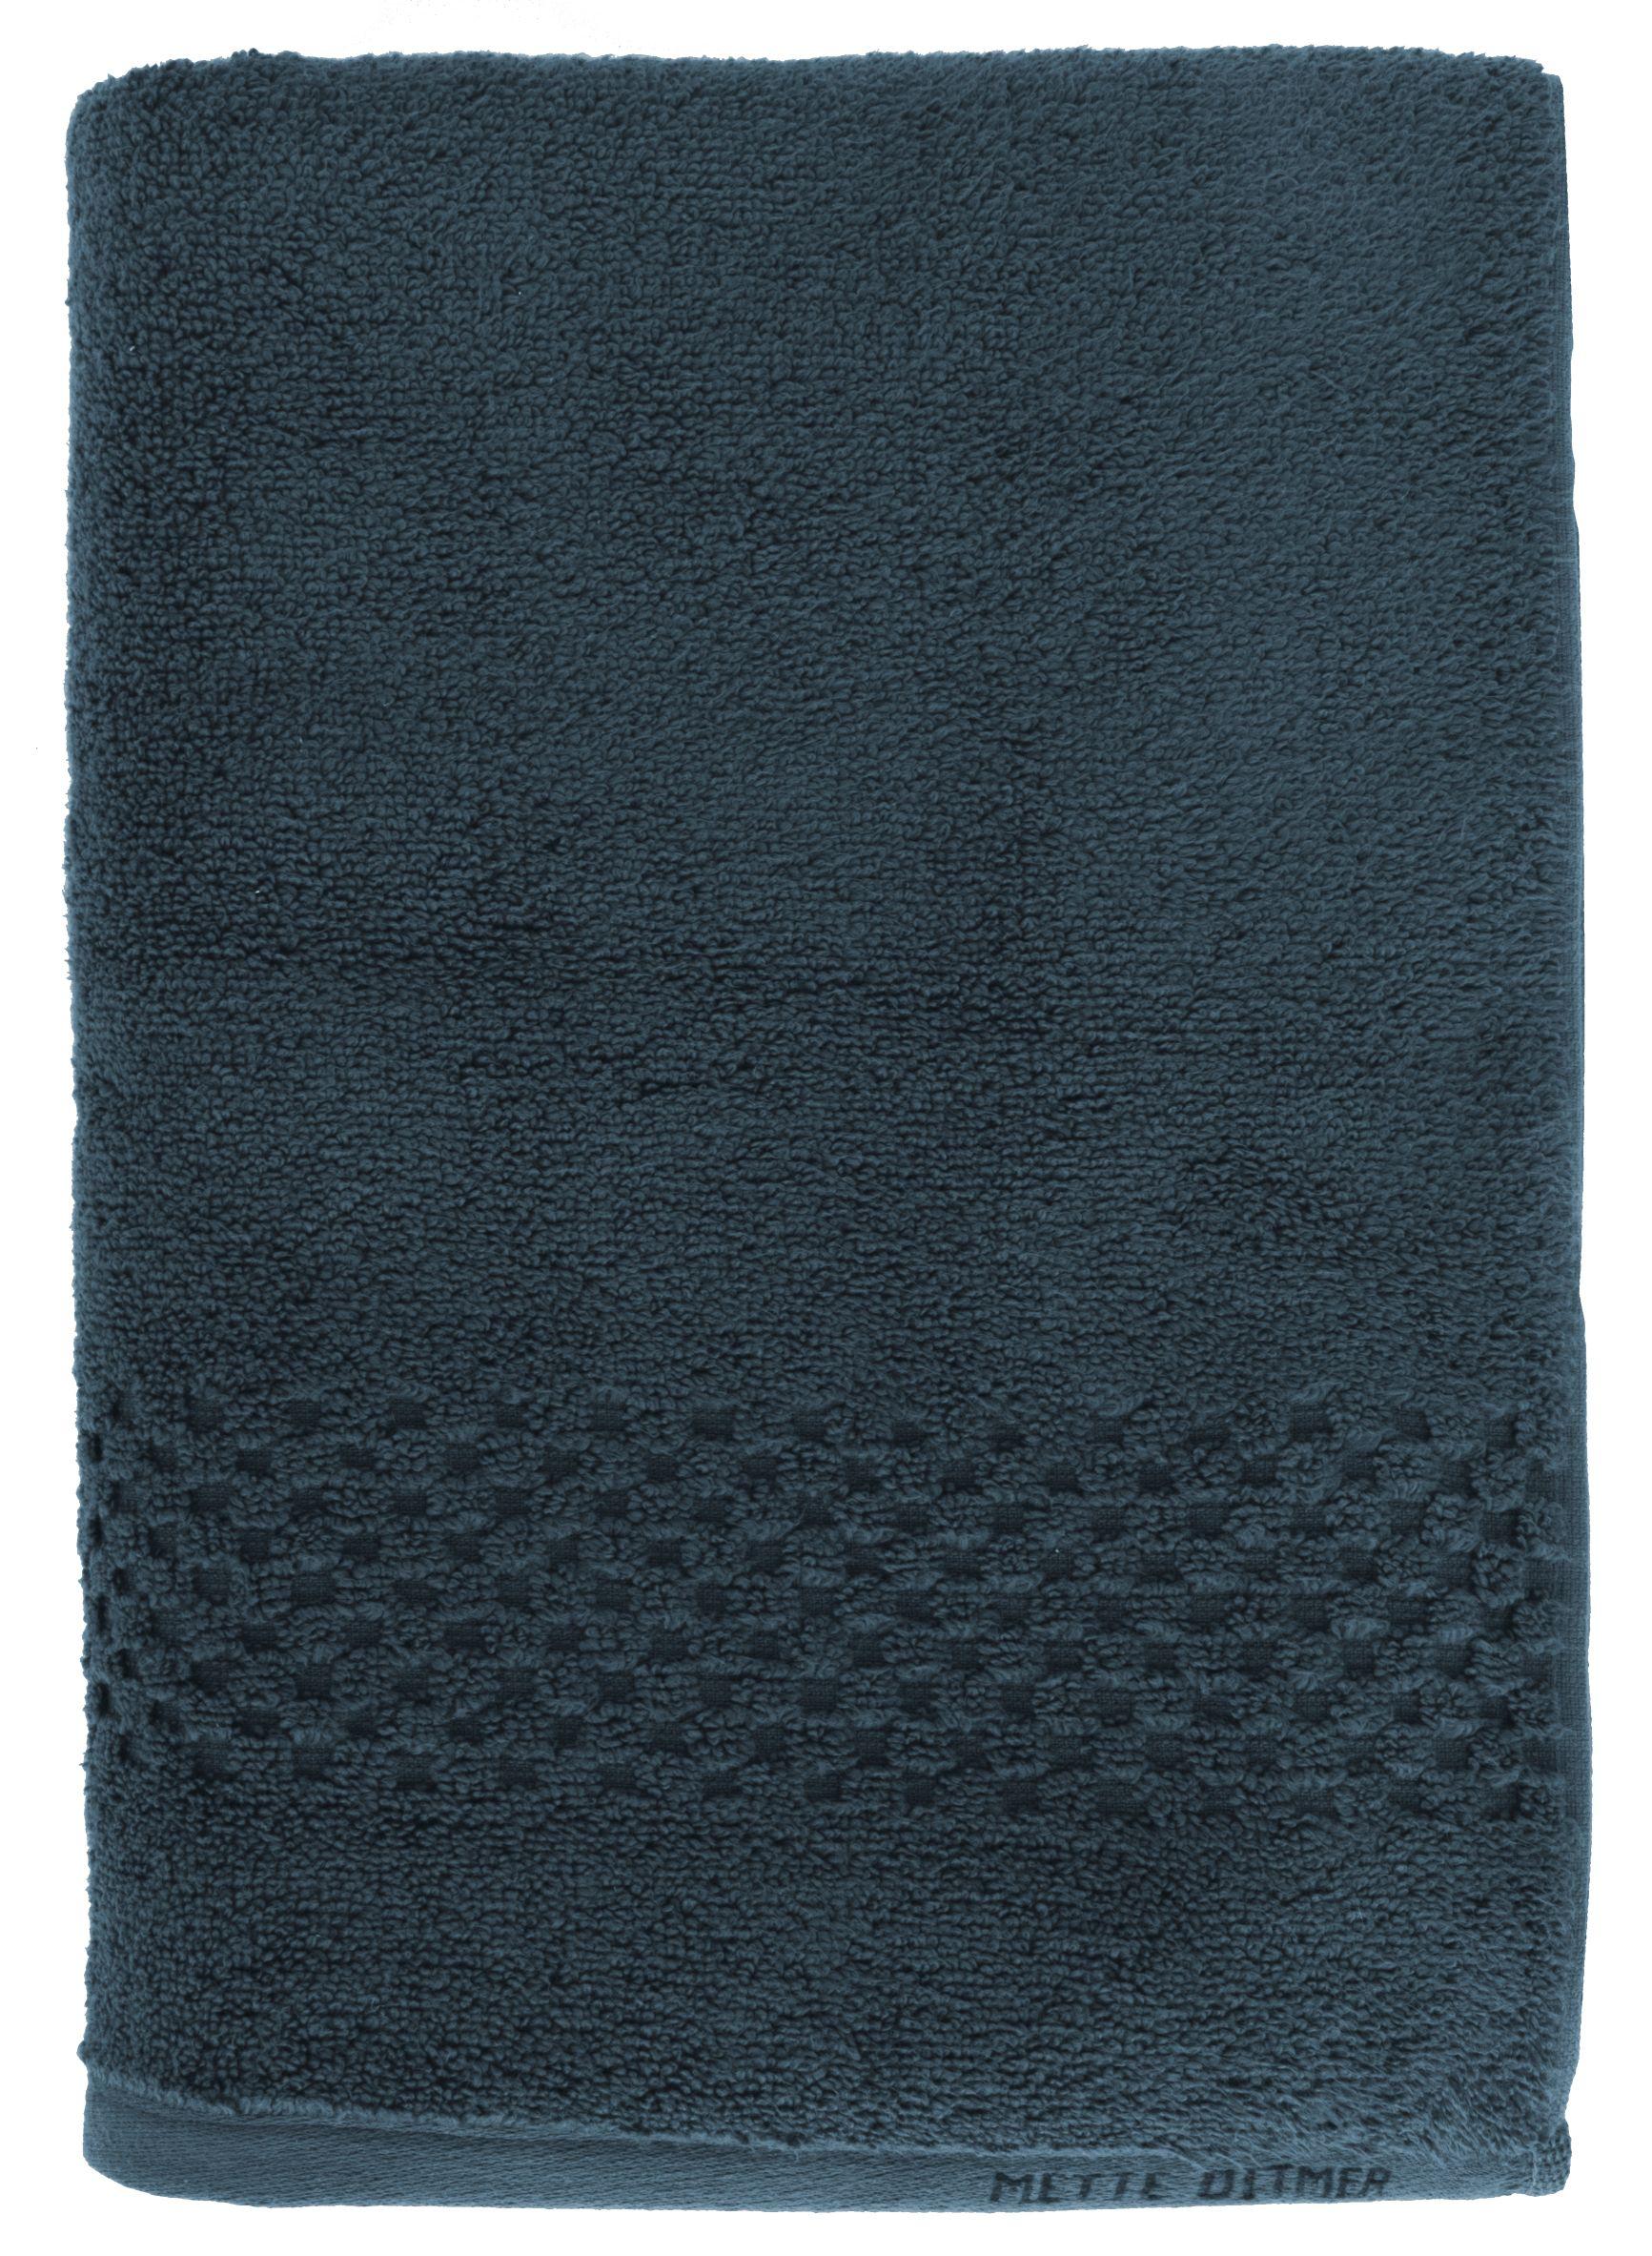 Mette Ditmer Seasons håndklæde, 70x135 cm, blå